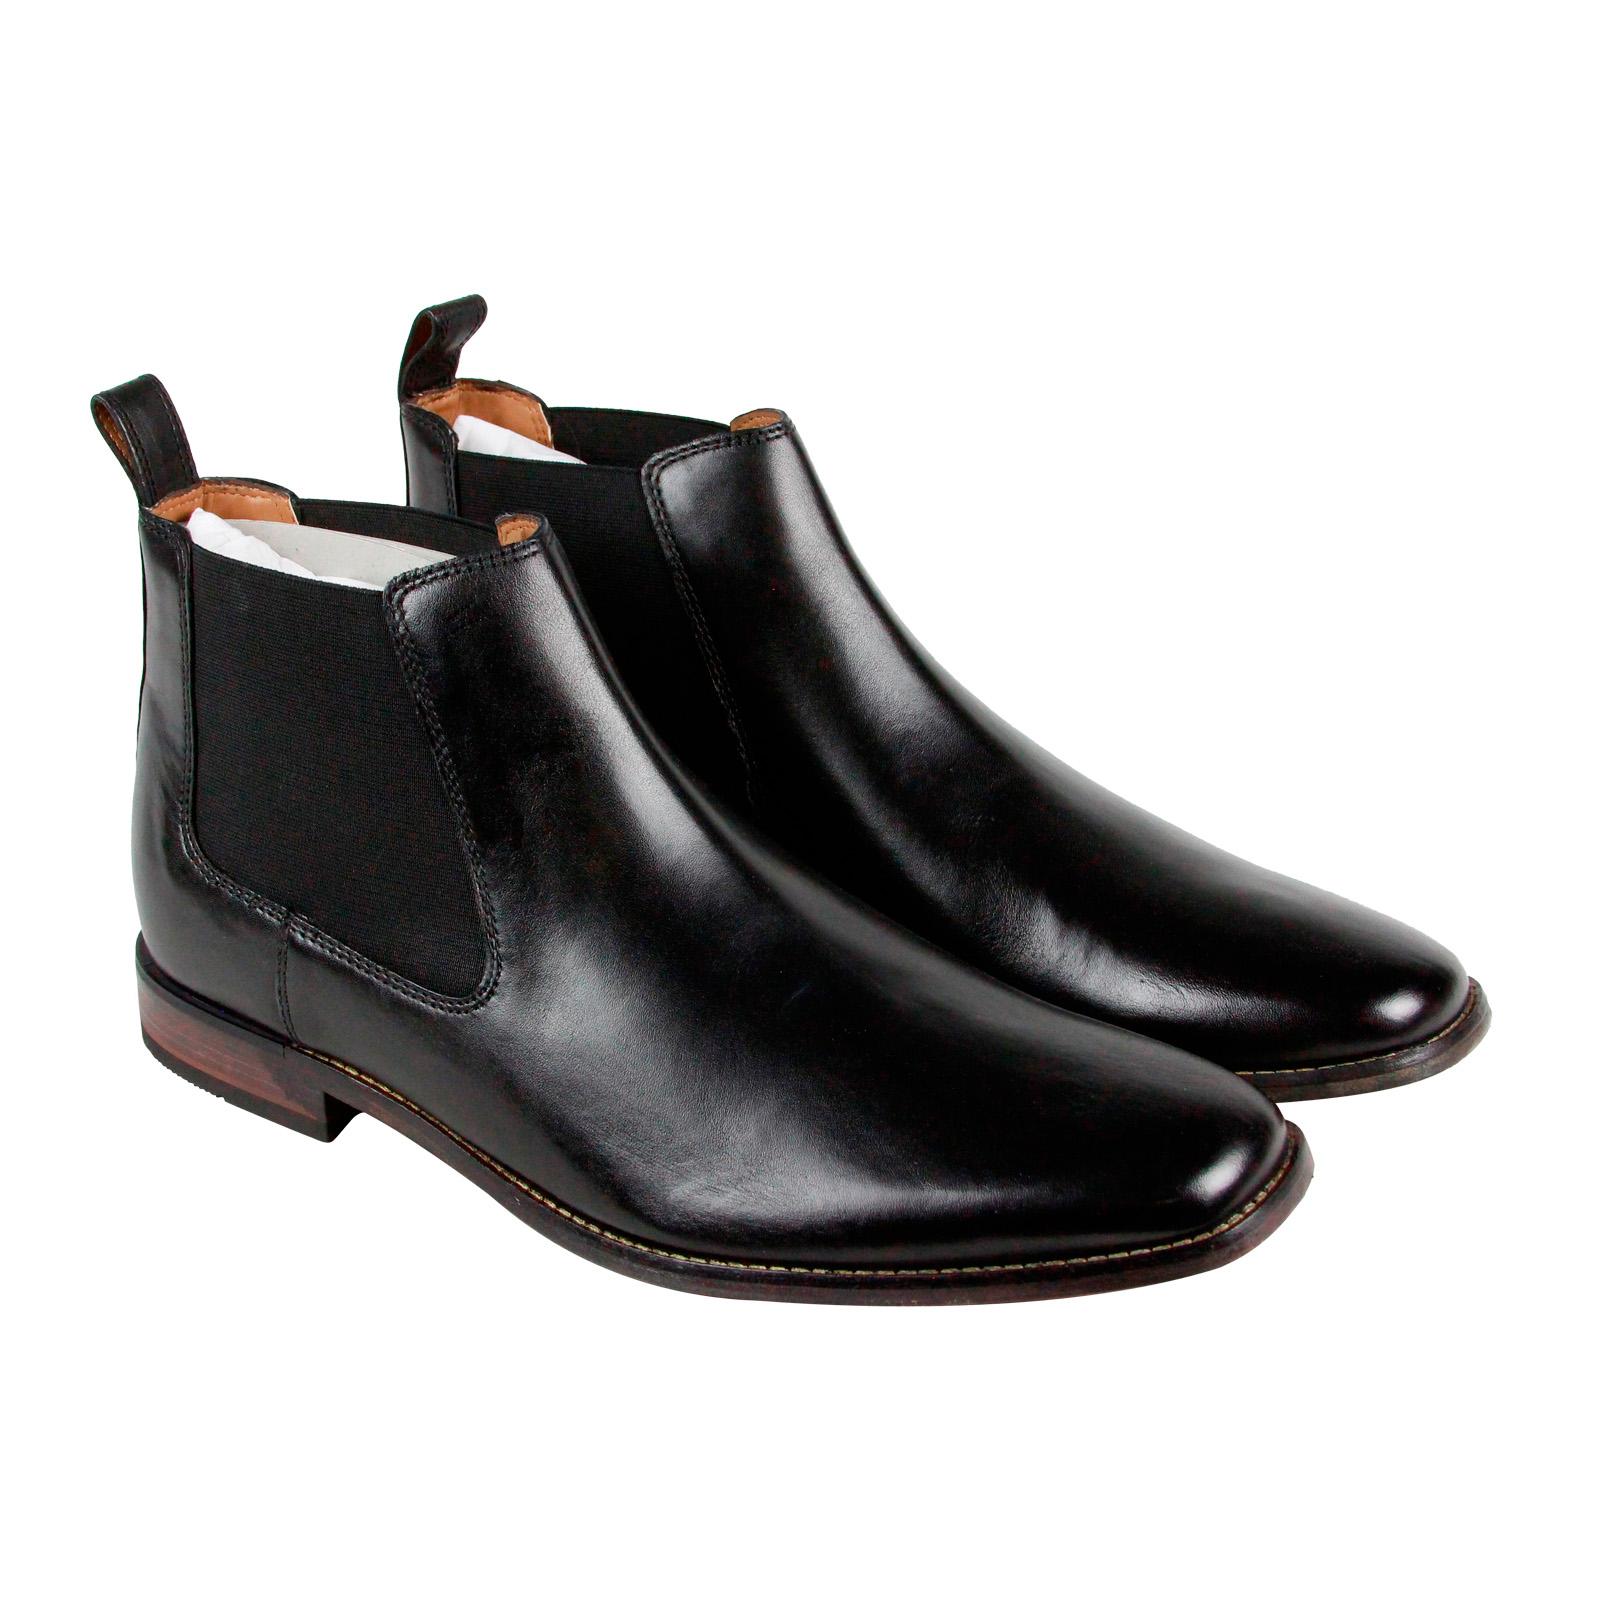 Clarks Narrate Plain Mens Black Leather Casual Dress Slip ...